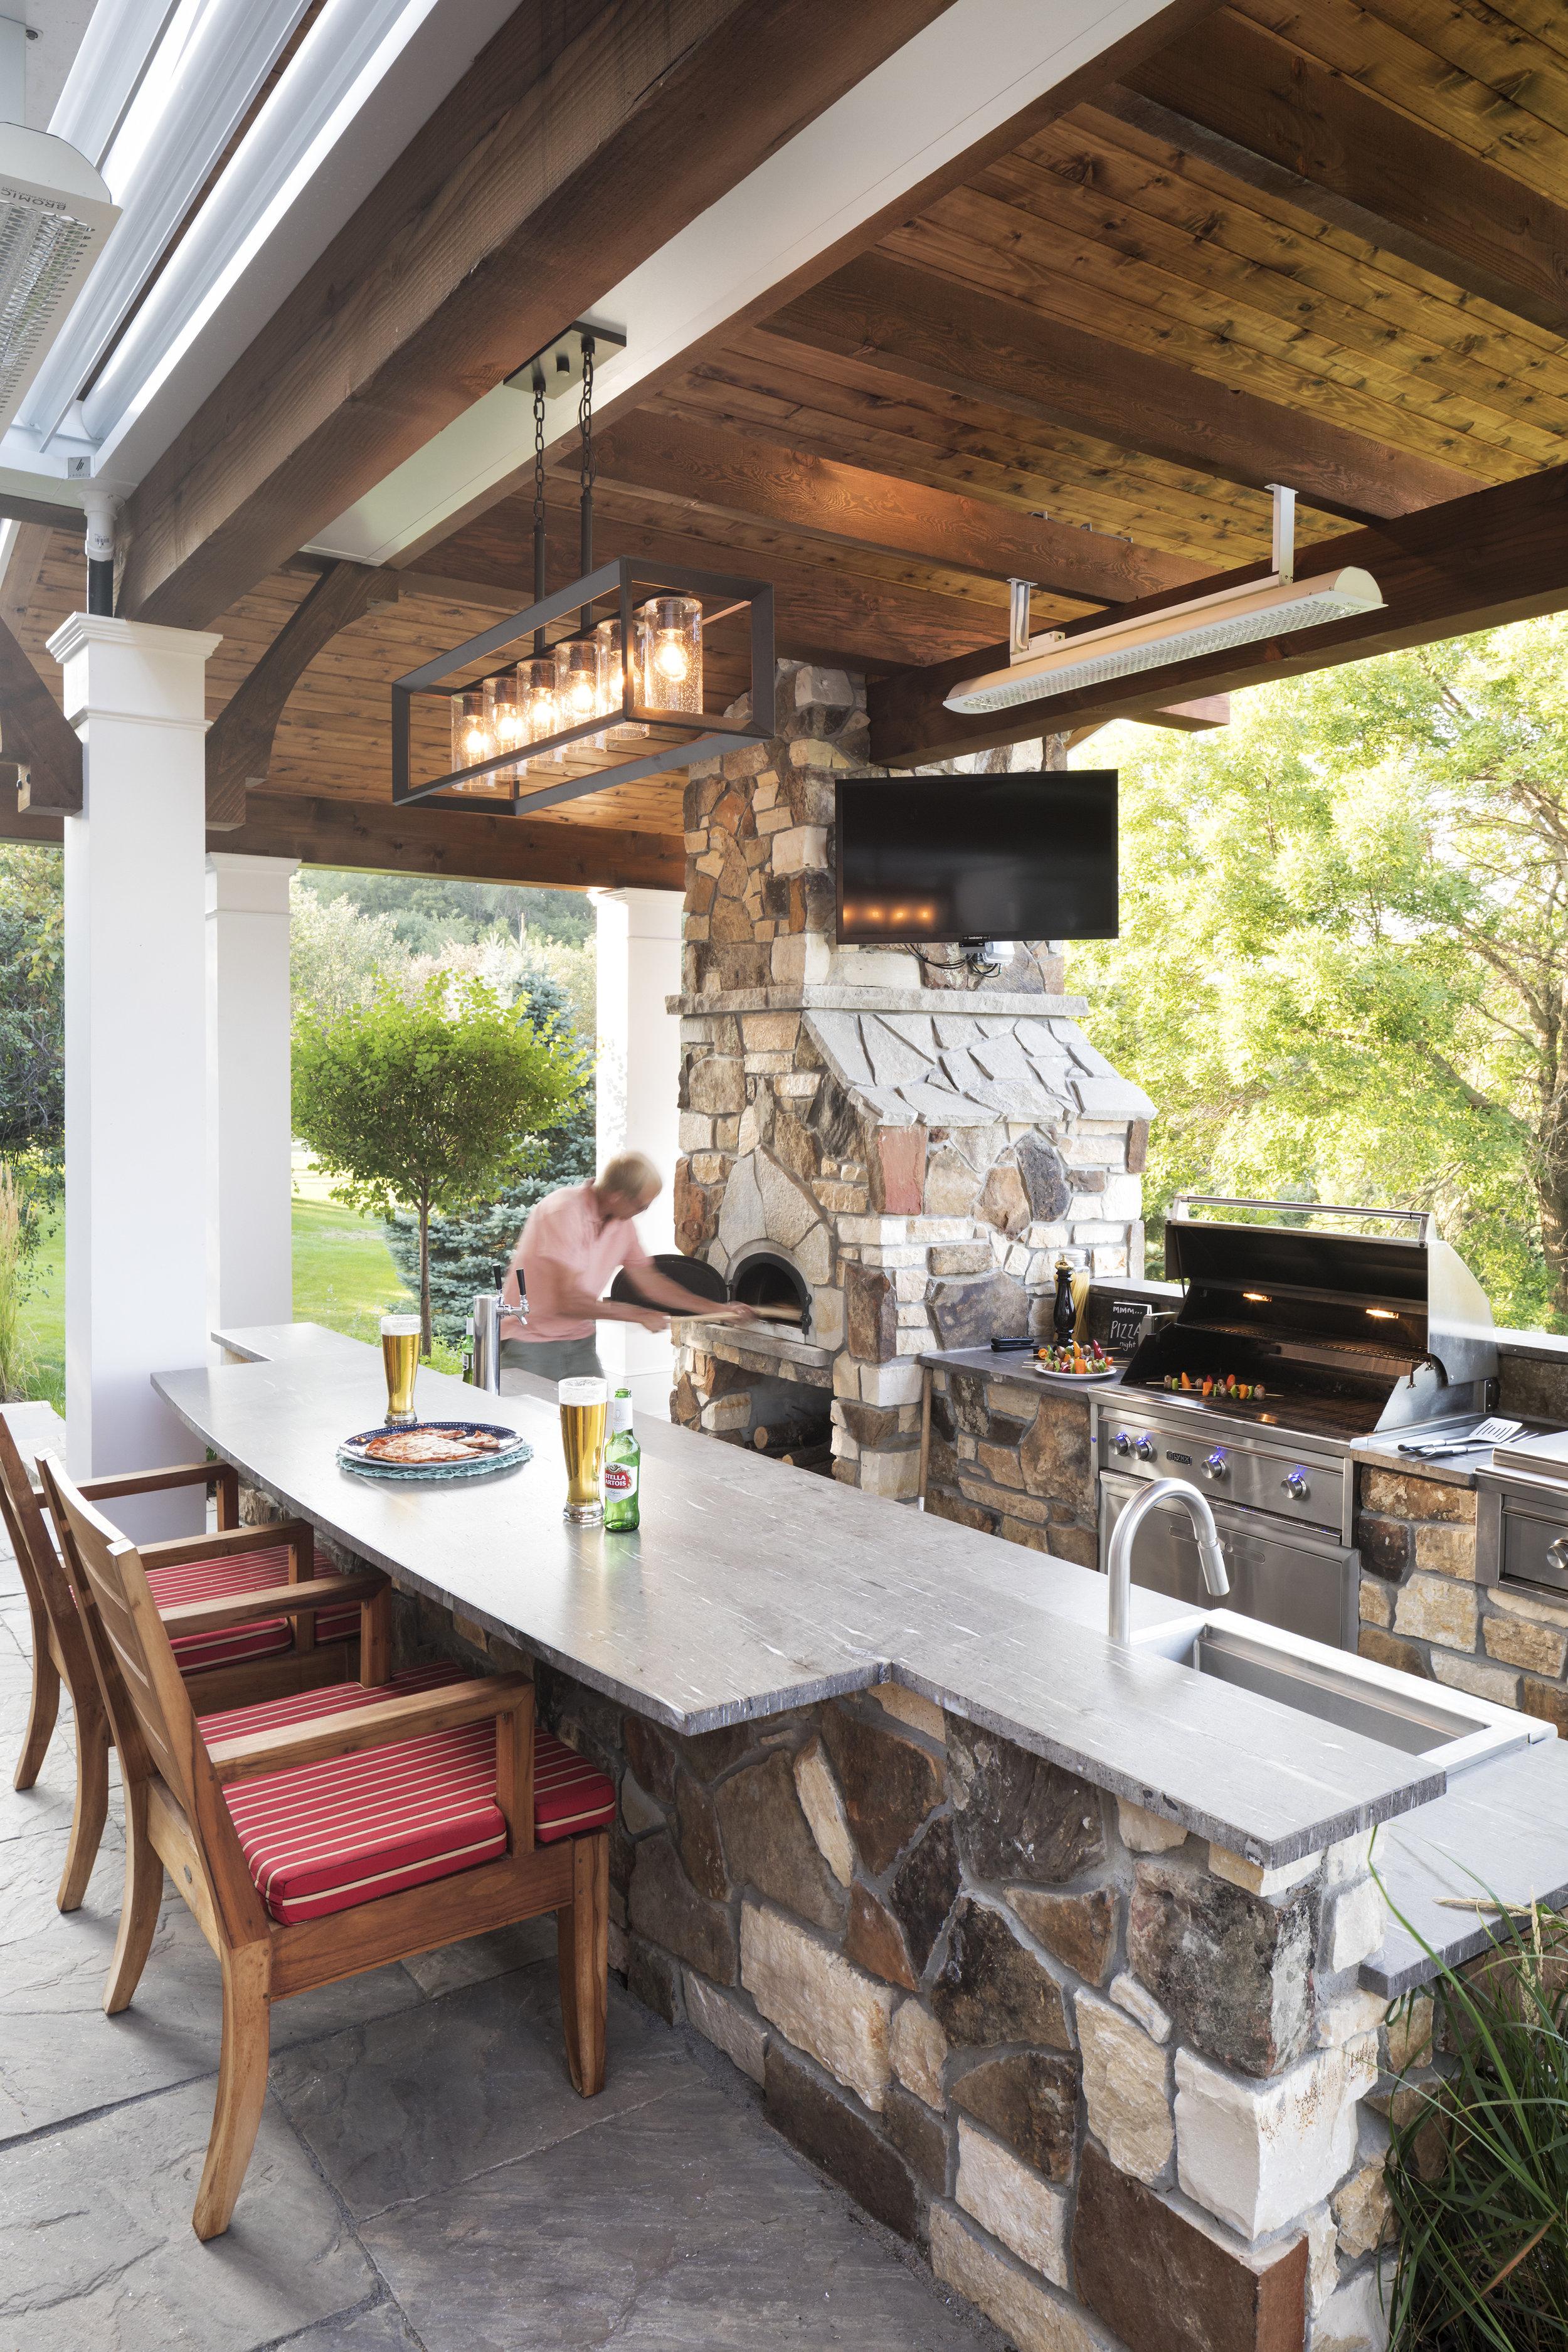 Mom's Design Build - Backyard Outdoor Kitchen Grill